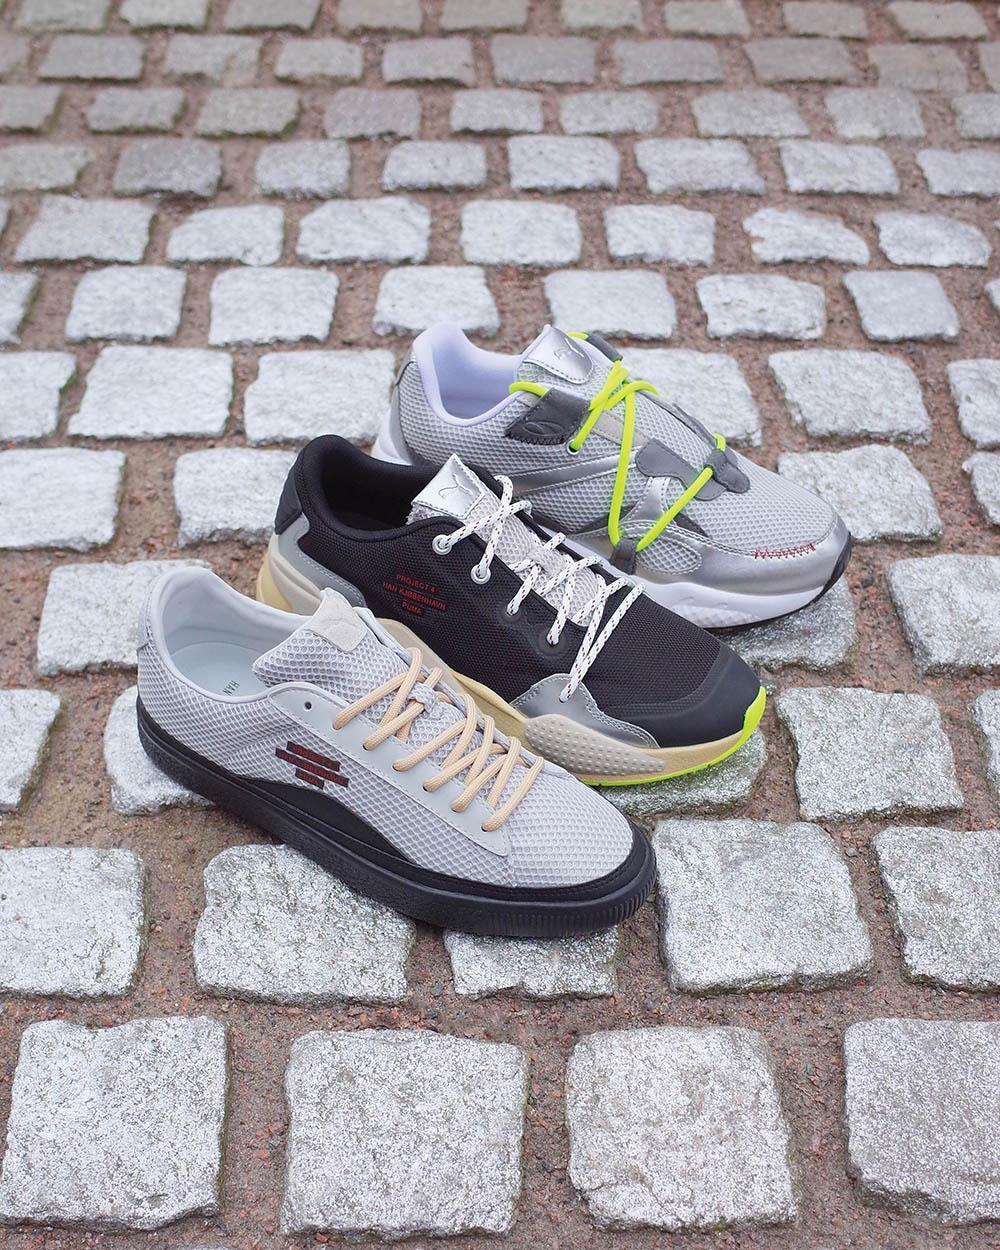 09e286878355 SHELTA - sneakers   street fashion since 2004